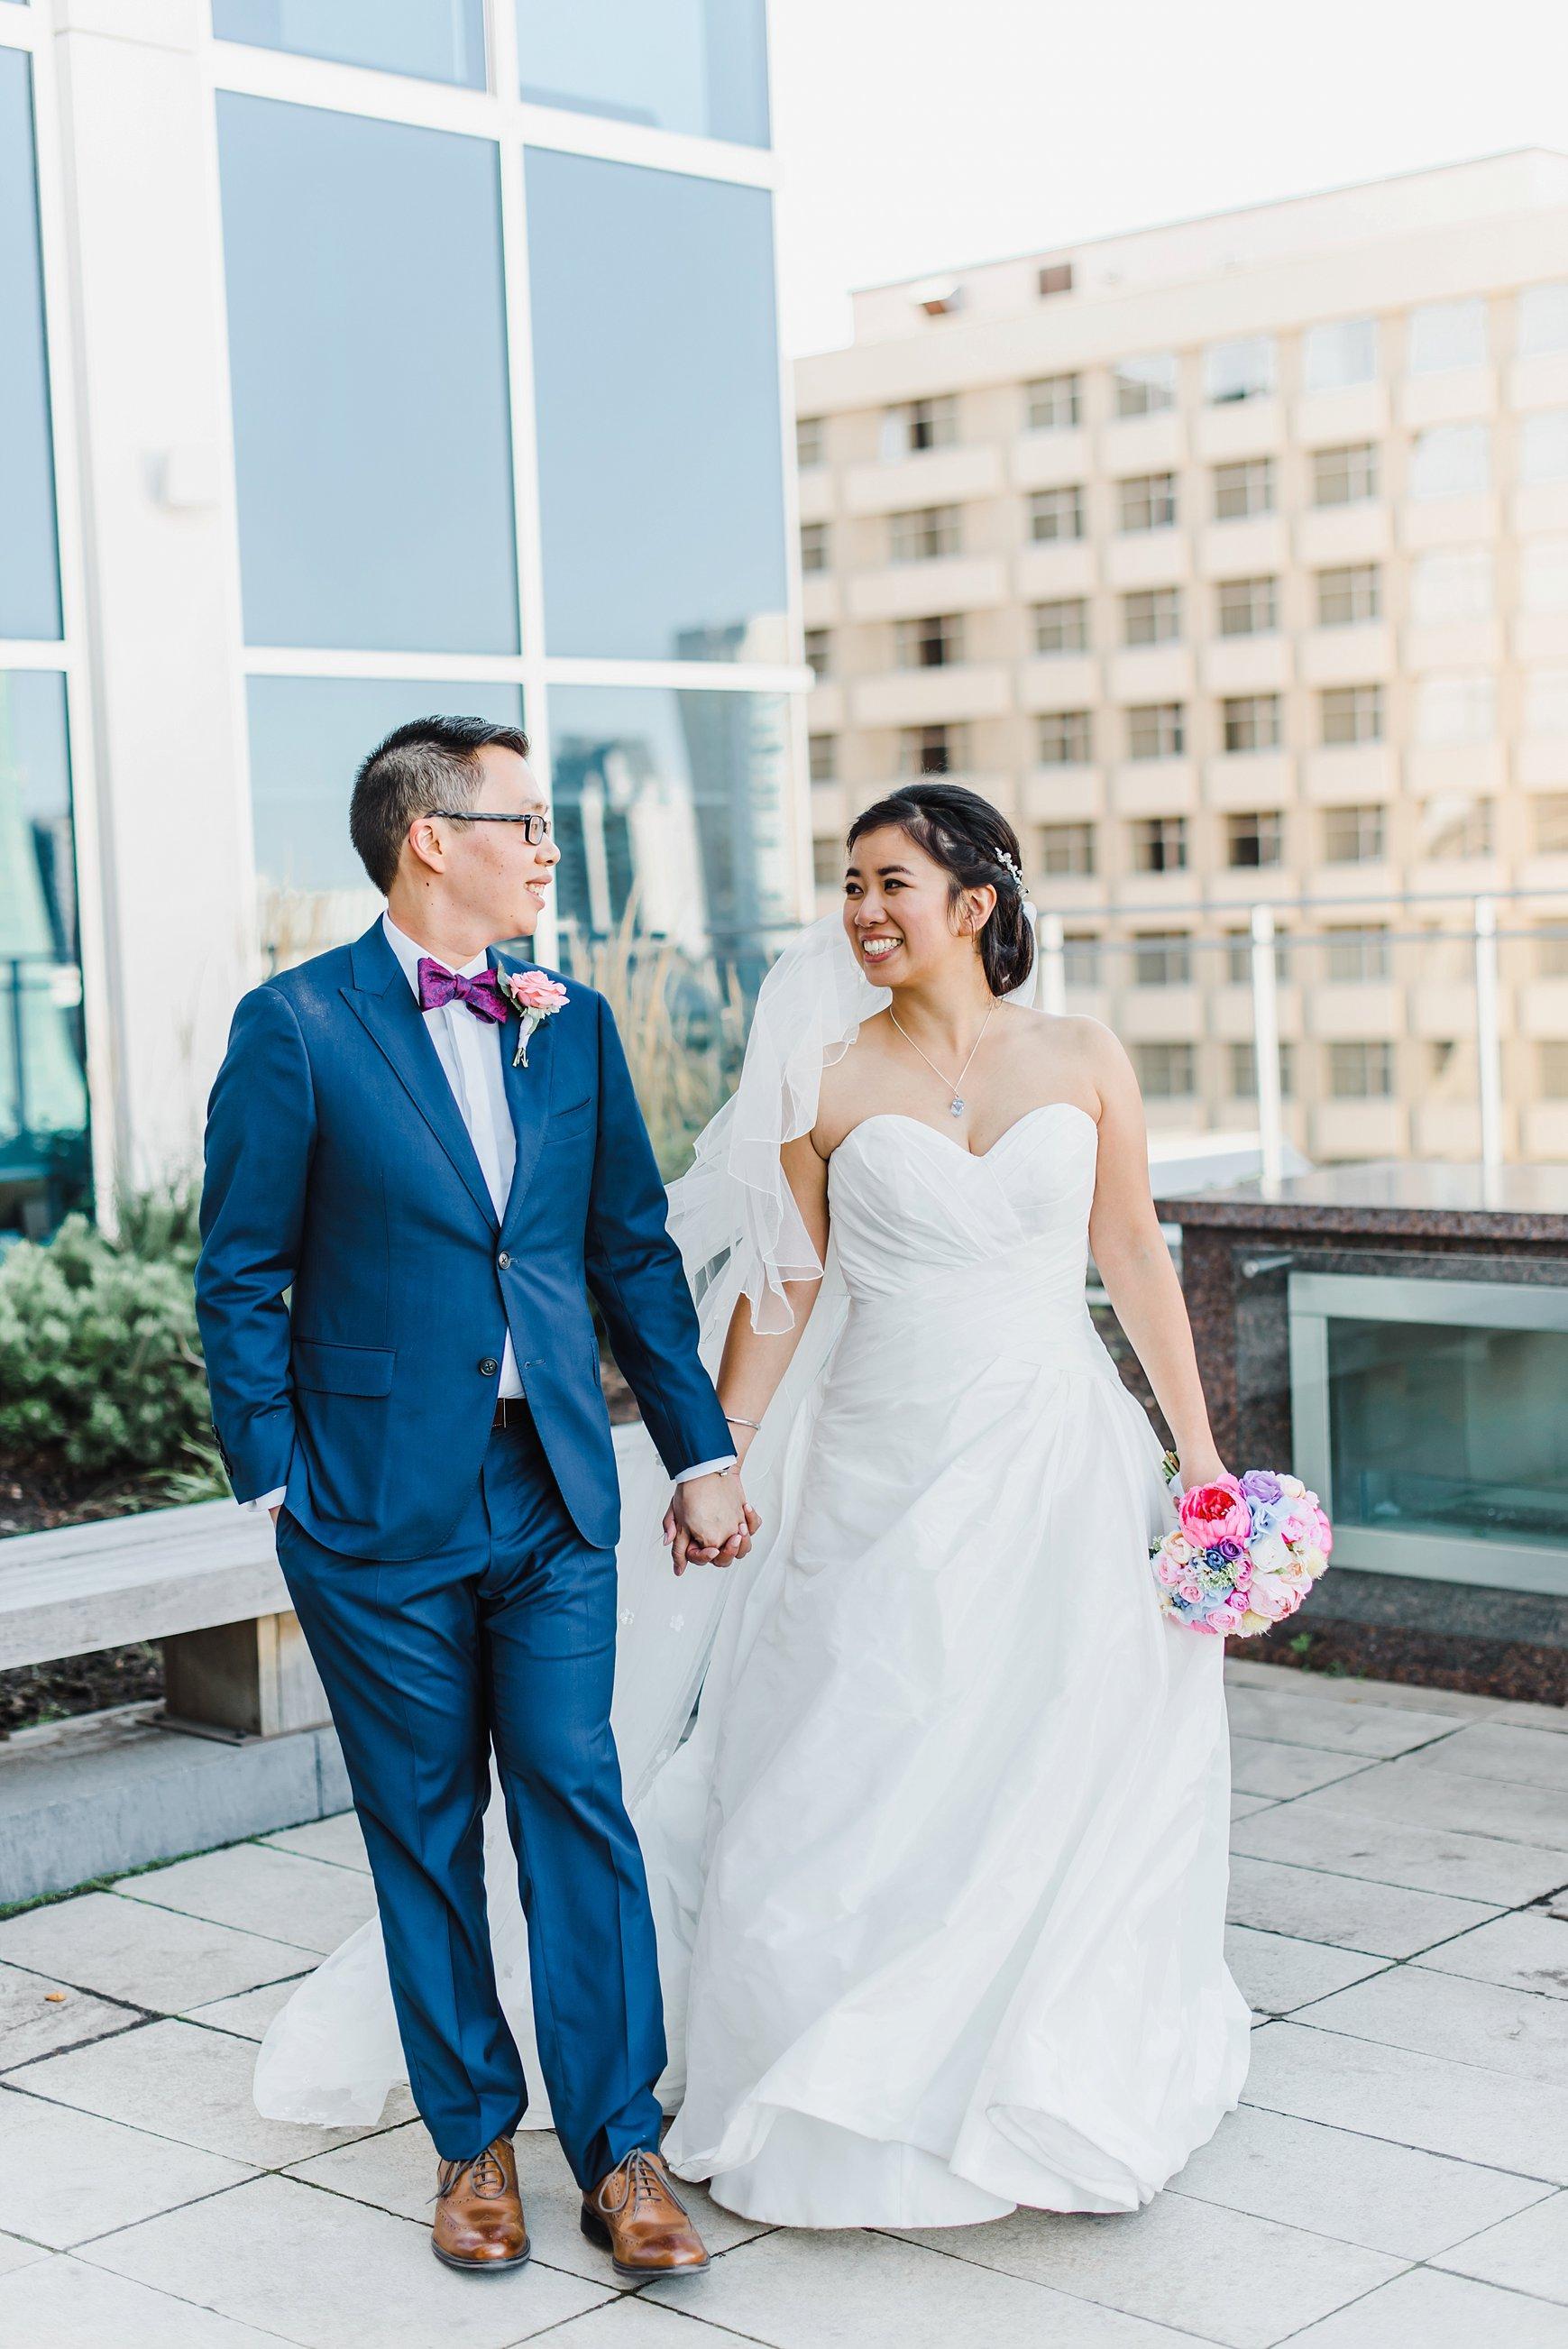 light airy indie fine art ottawa wedding photographer | Ali and Batoul Photography_1529.jpg